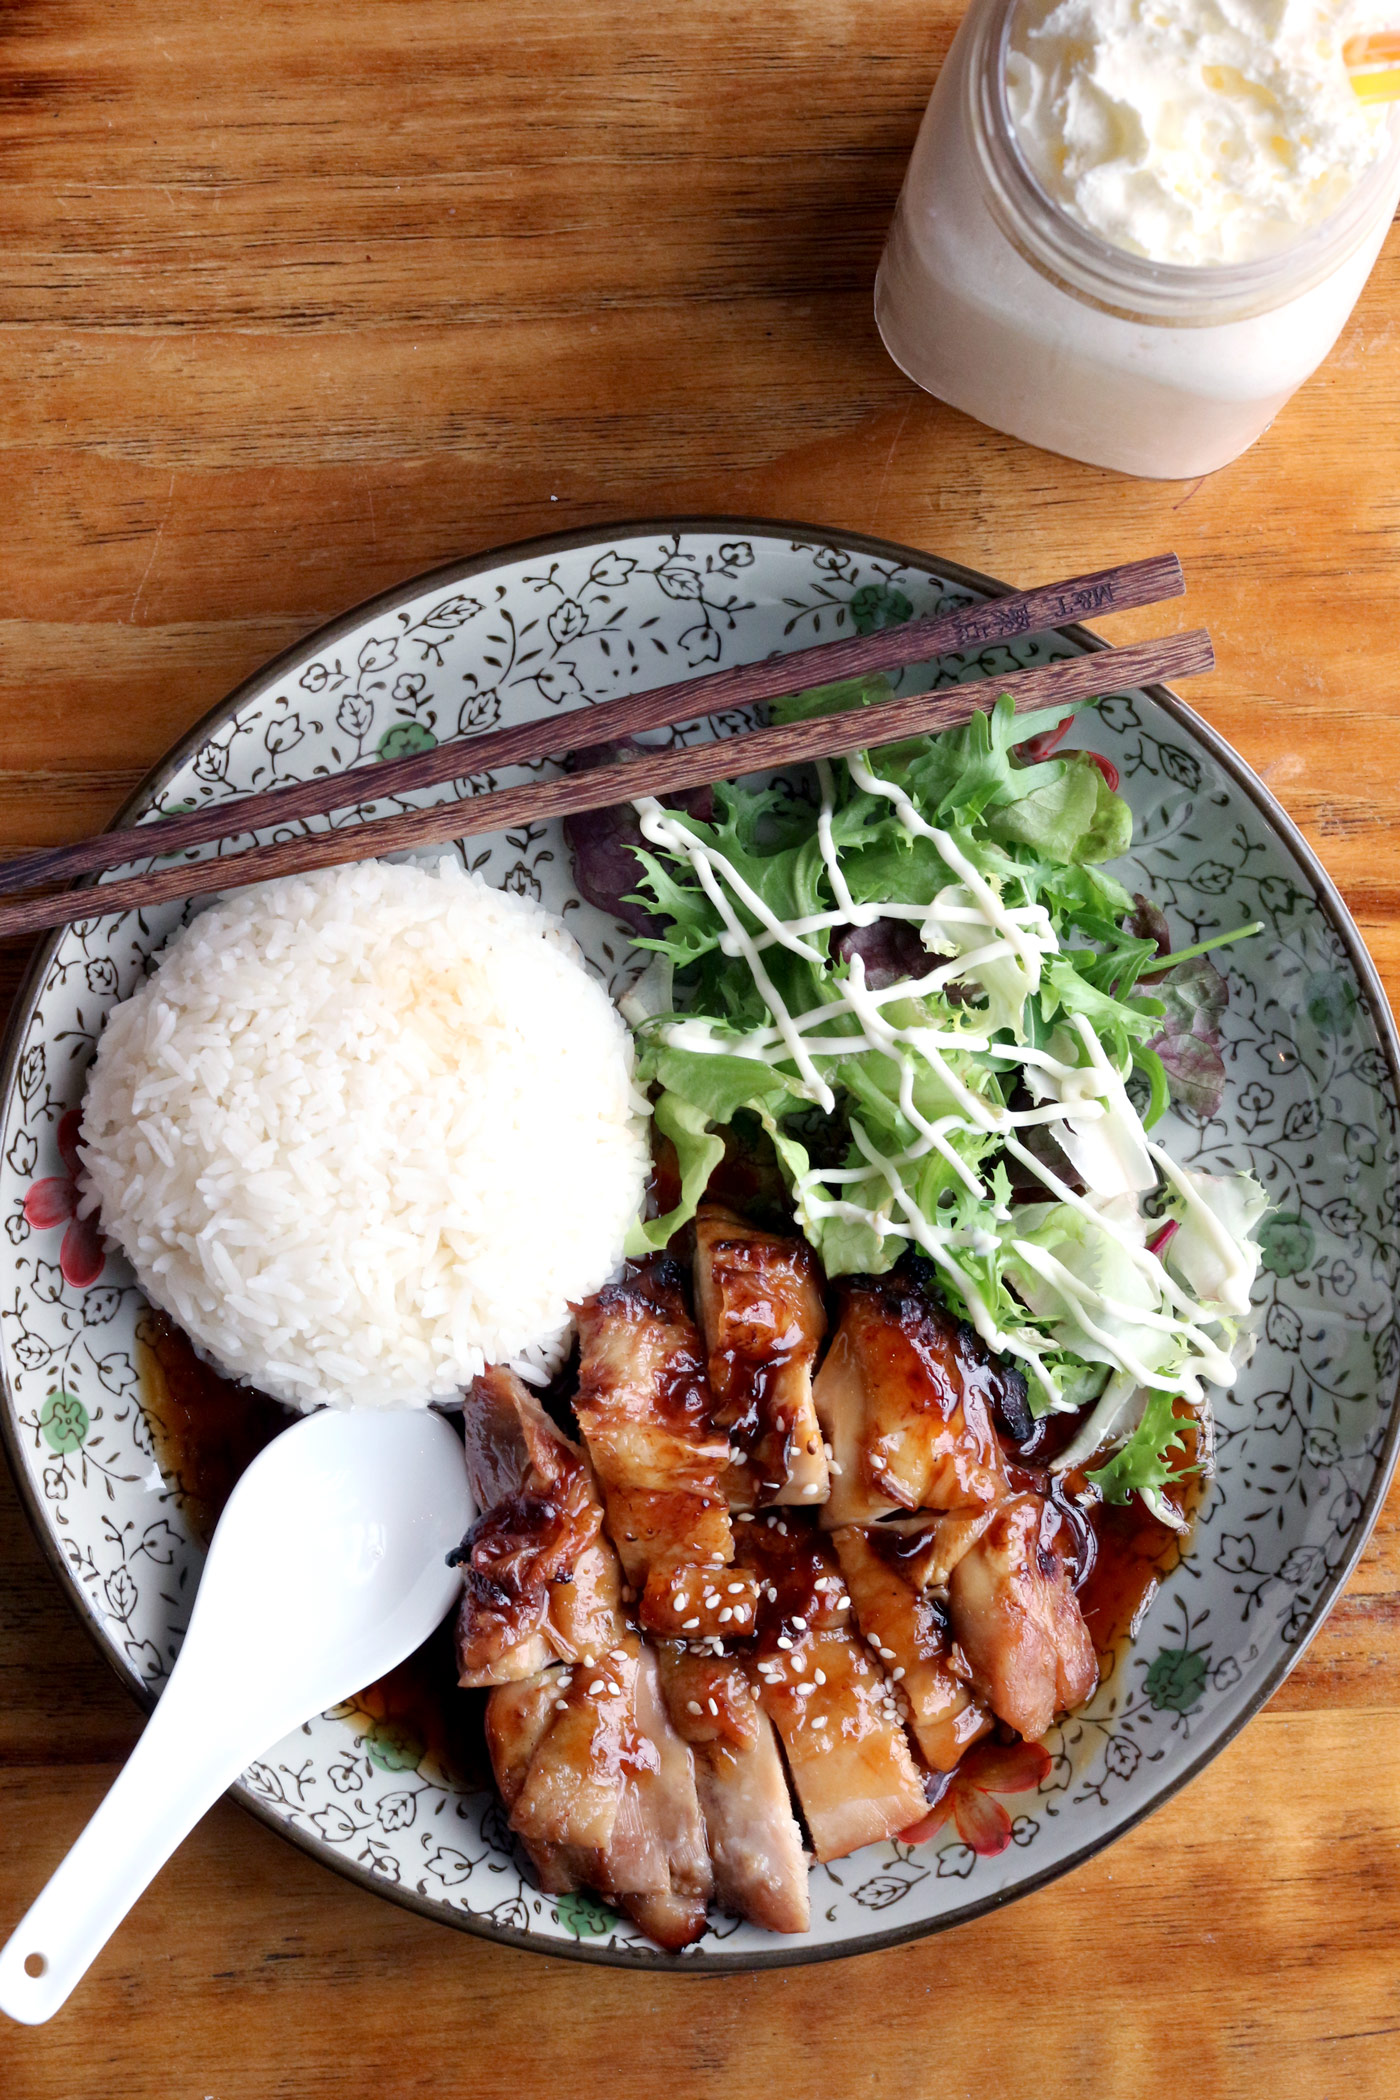 meet-and-treat-newcastle-chinatown-cafe-milkshake-2